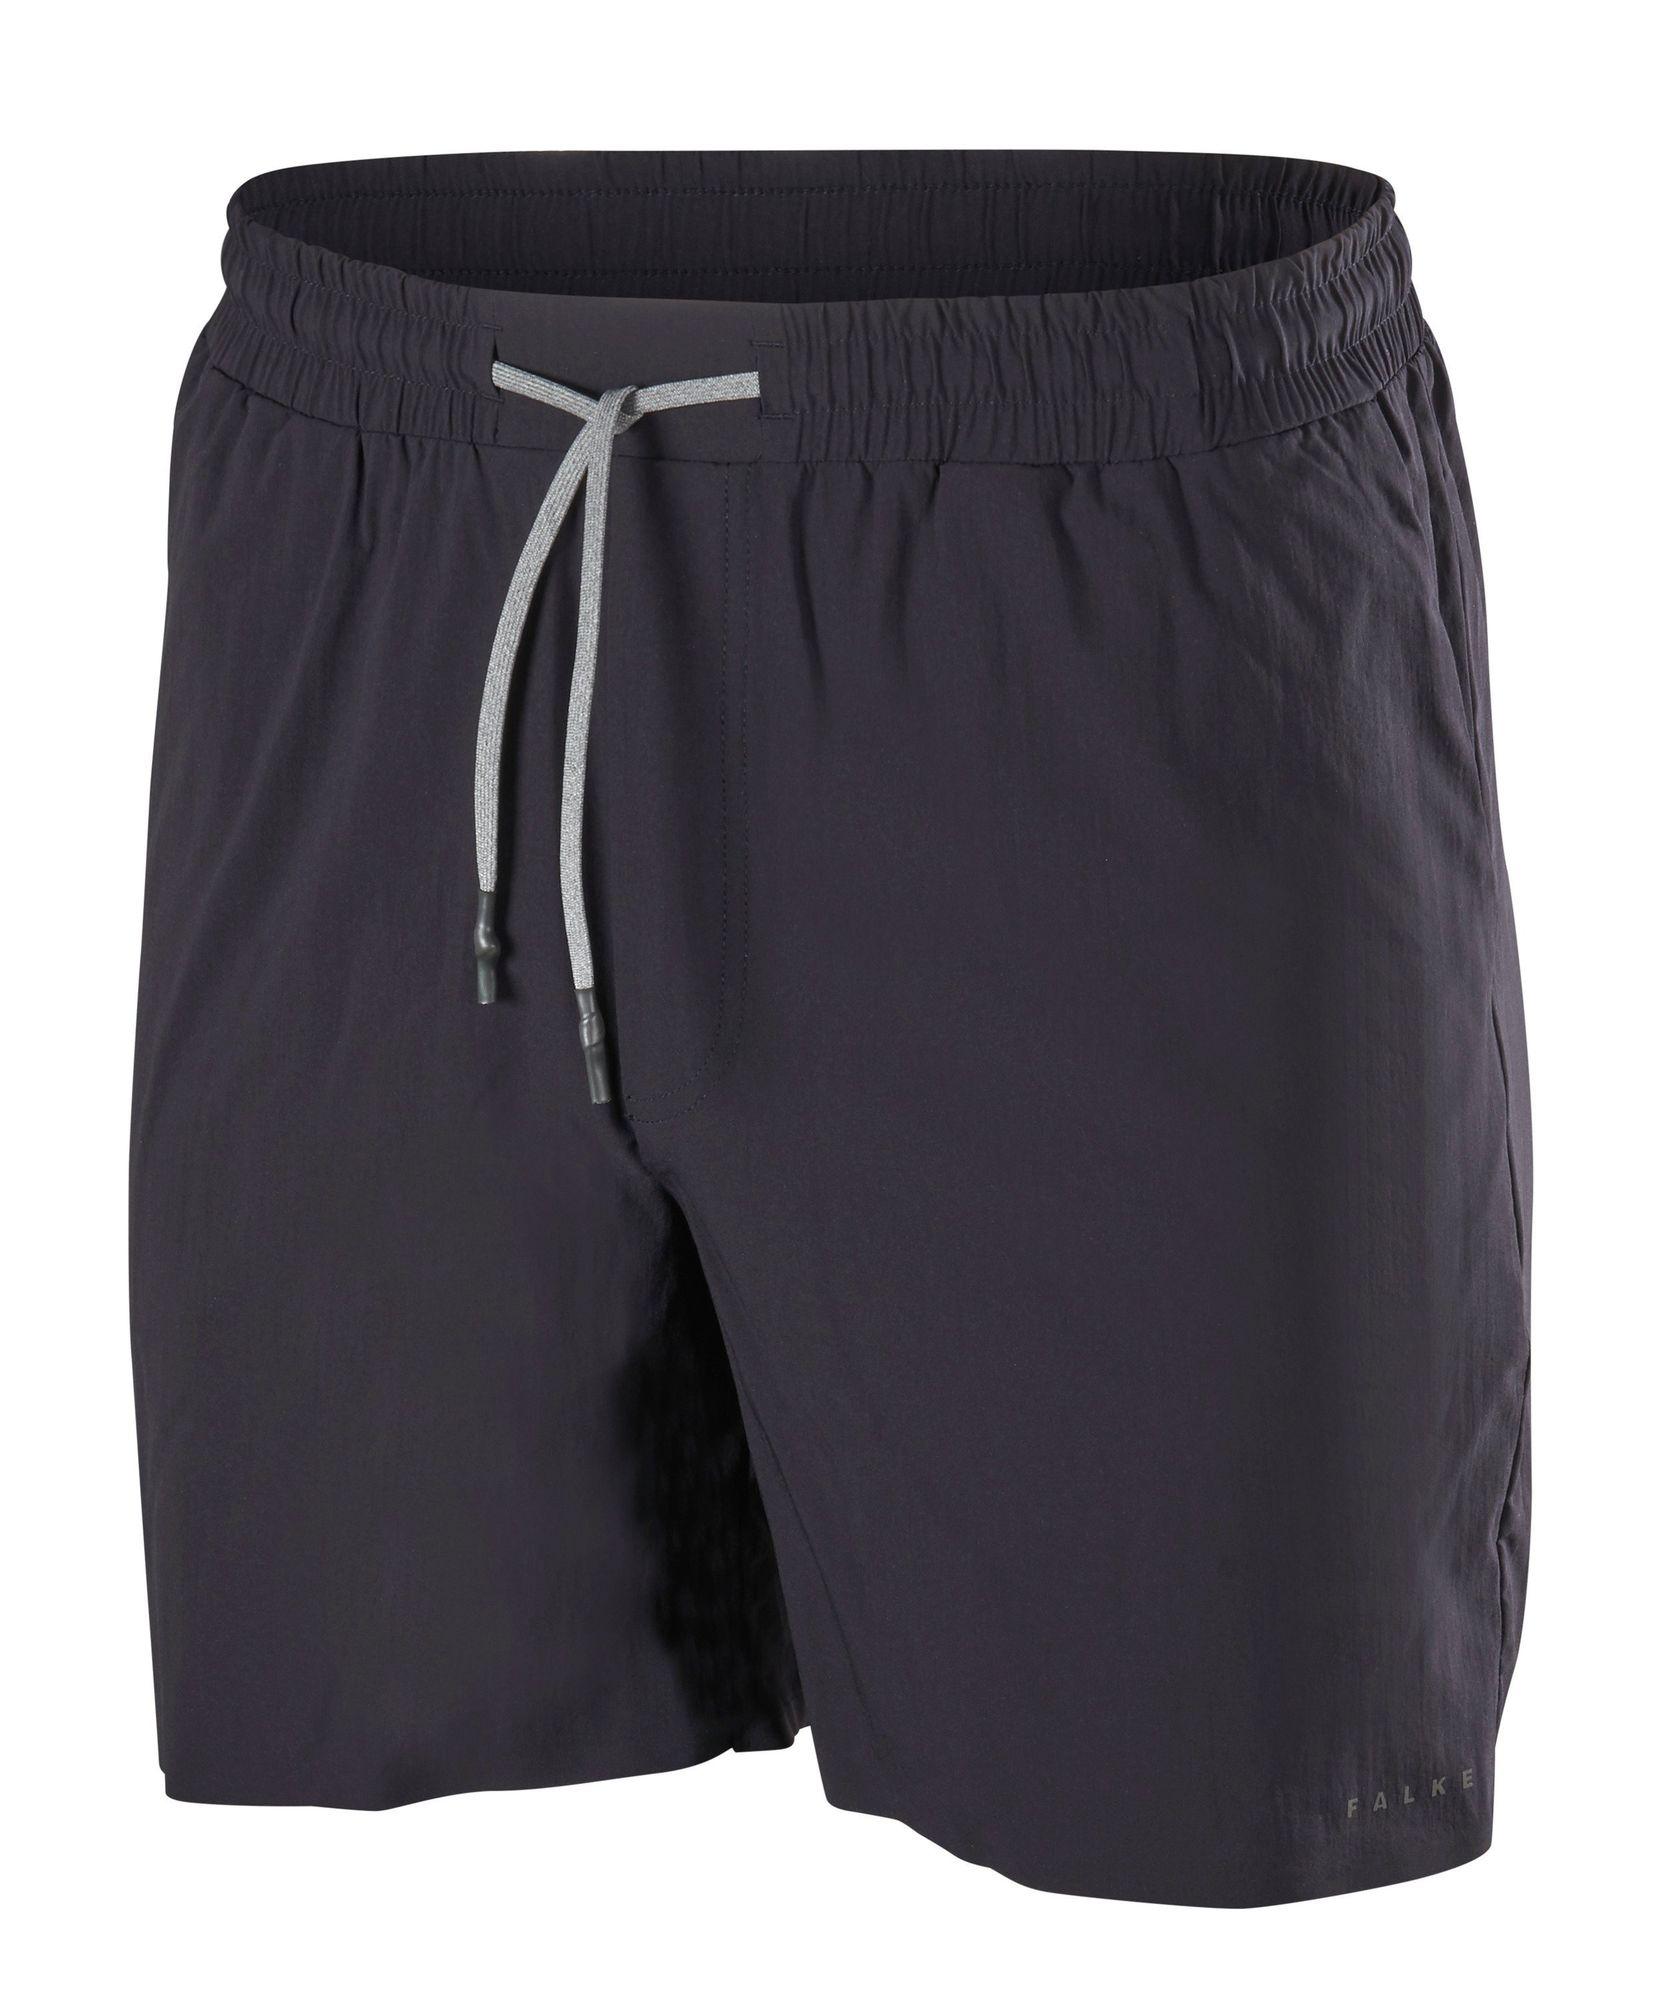 Falke Basic Challenger Shorts in Schwarz